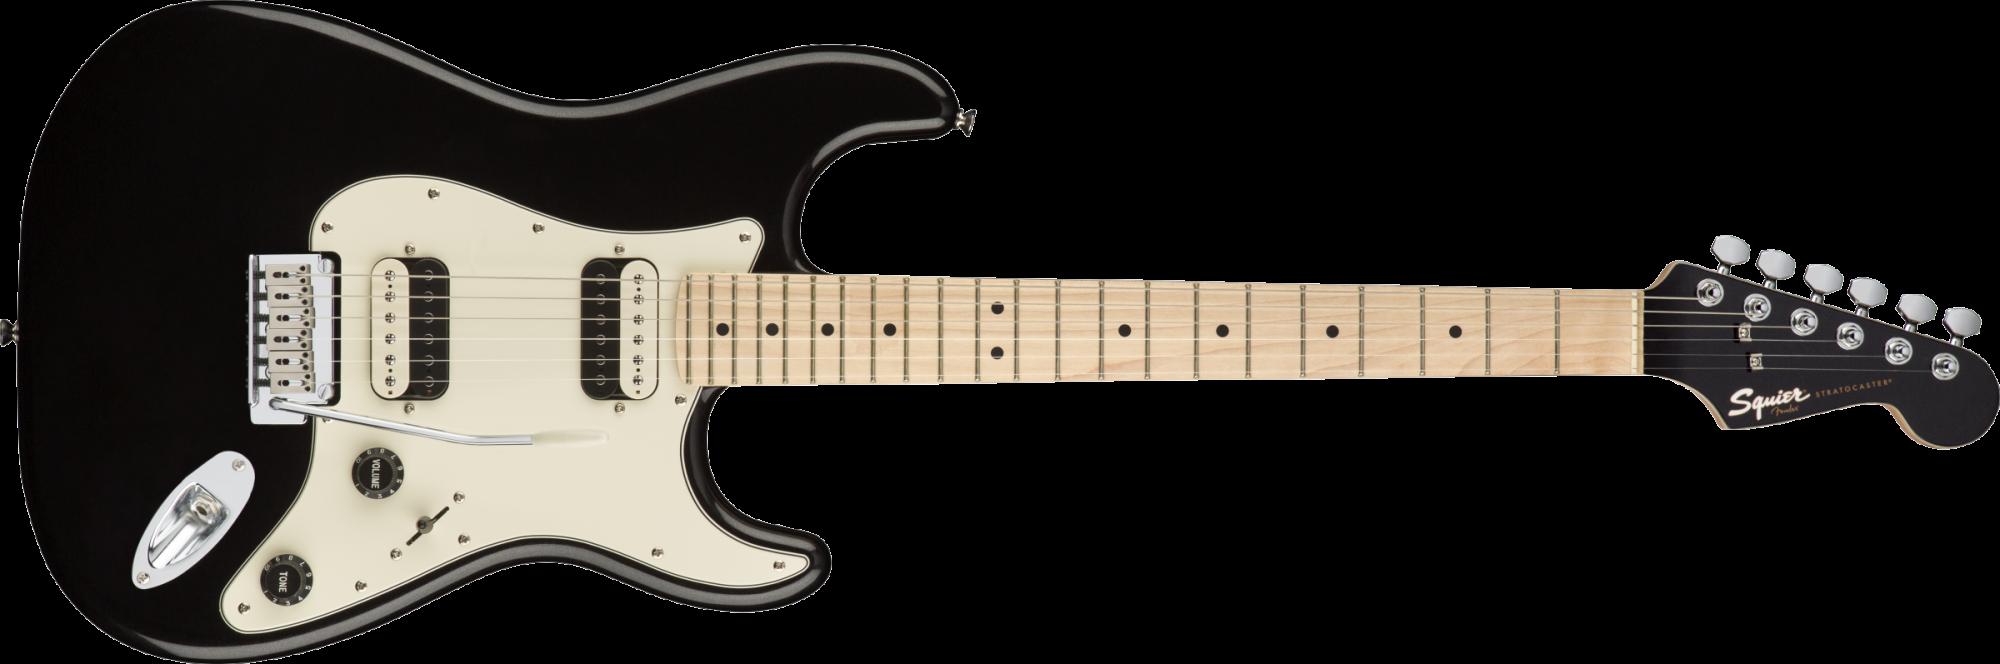 Squier Contemporary Stratocaster HH